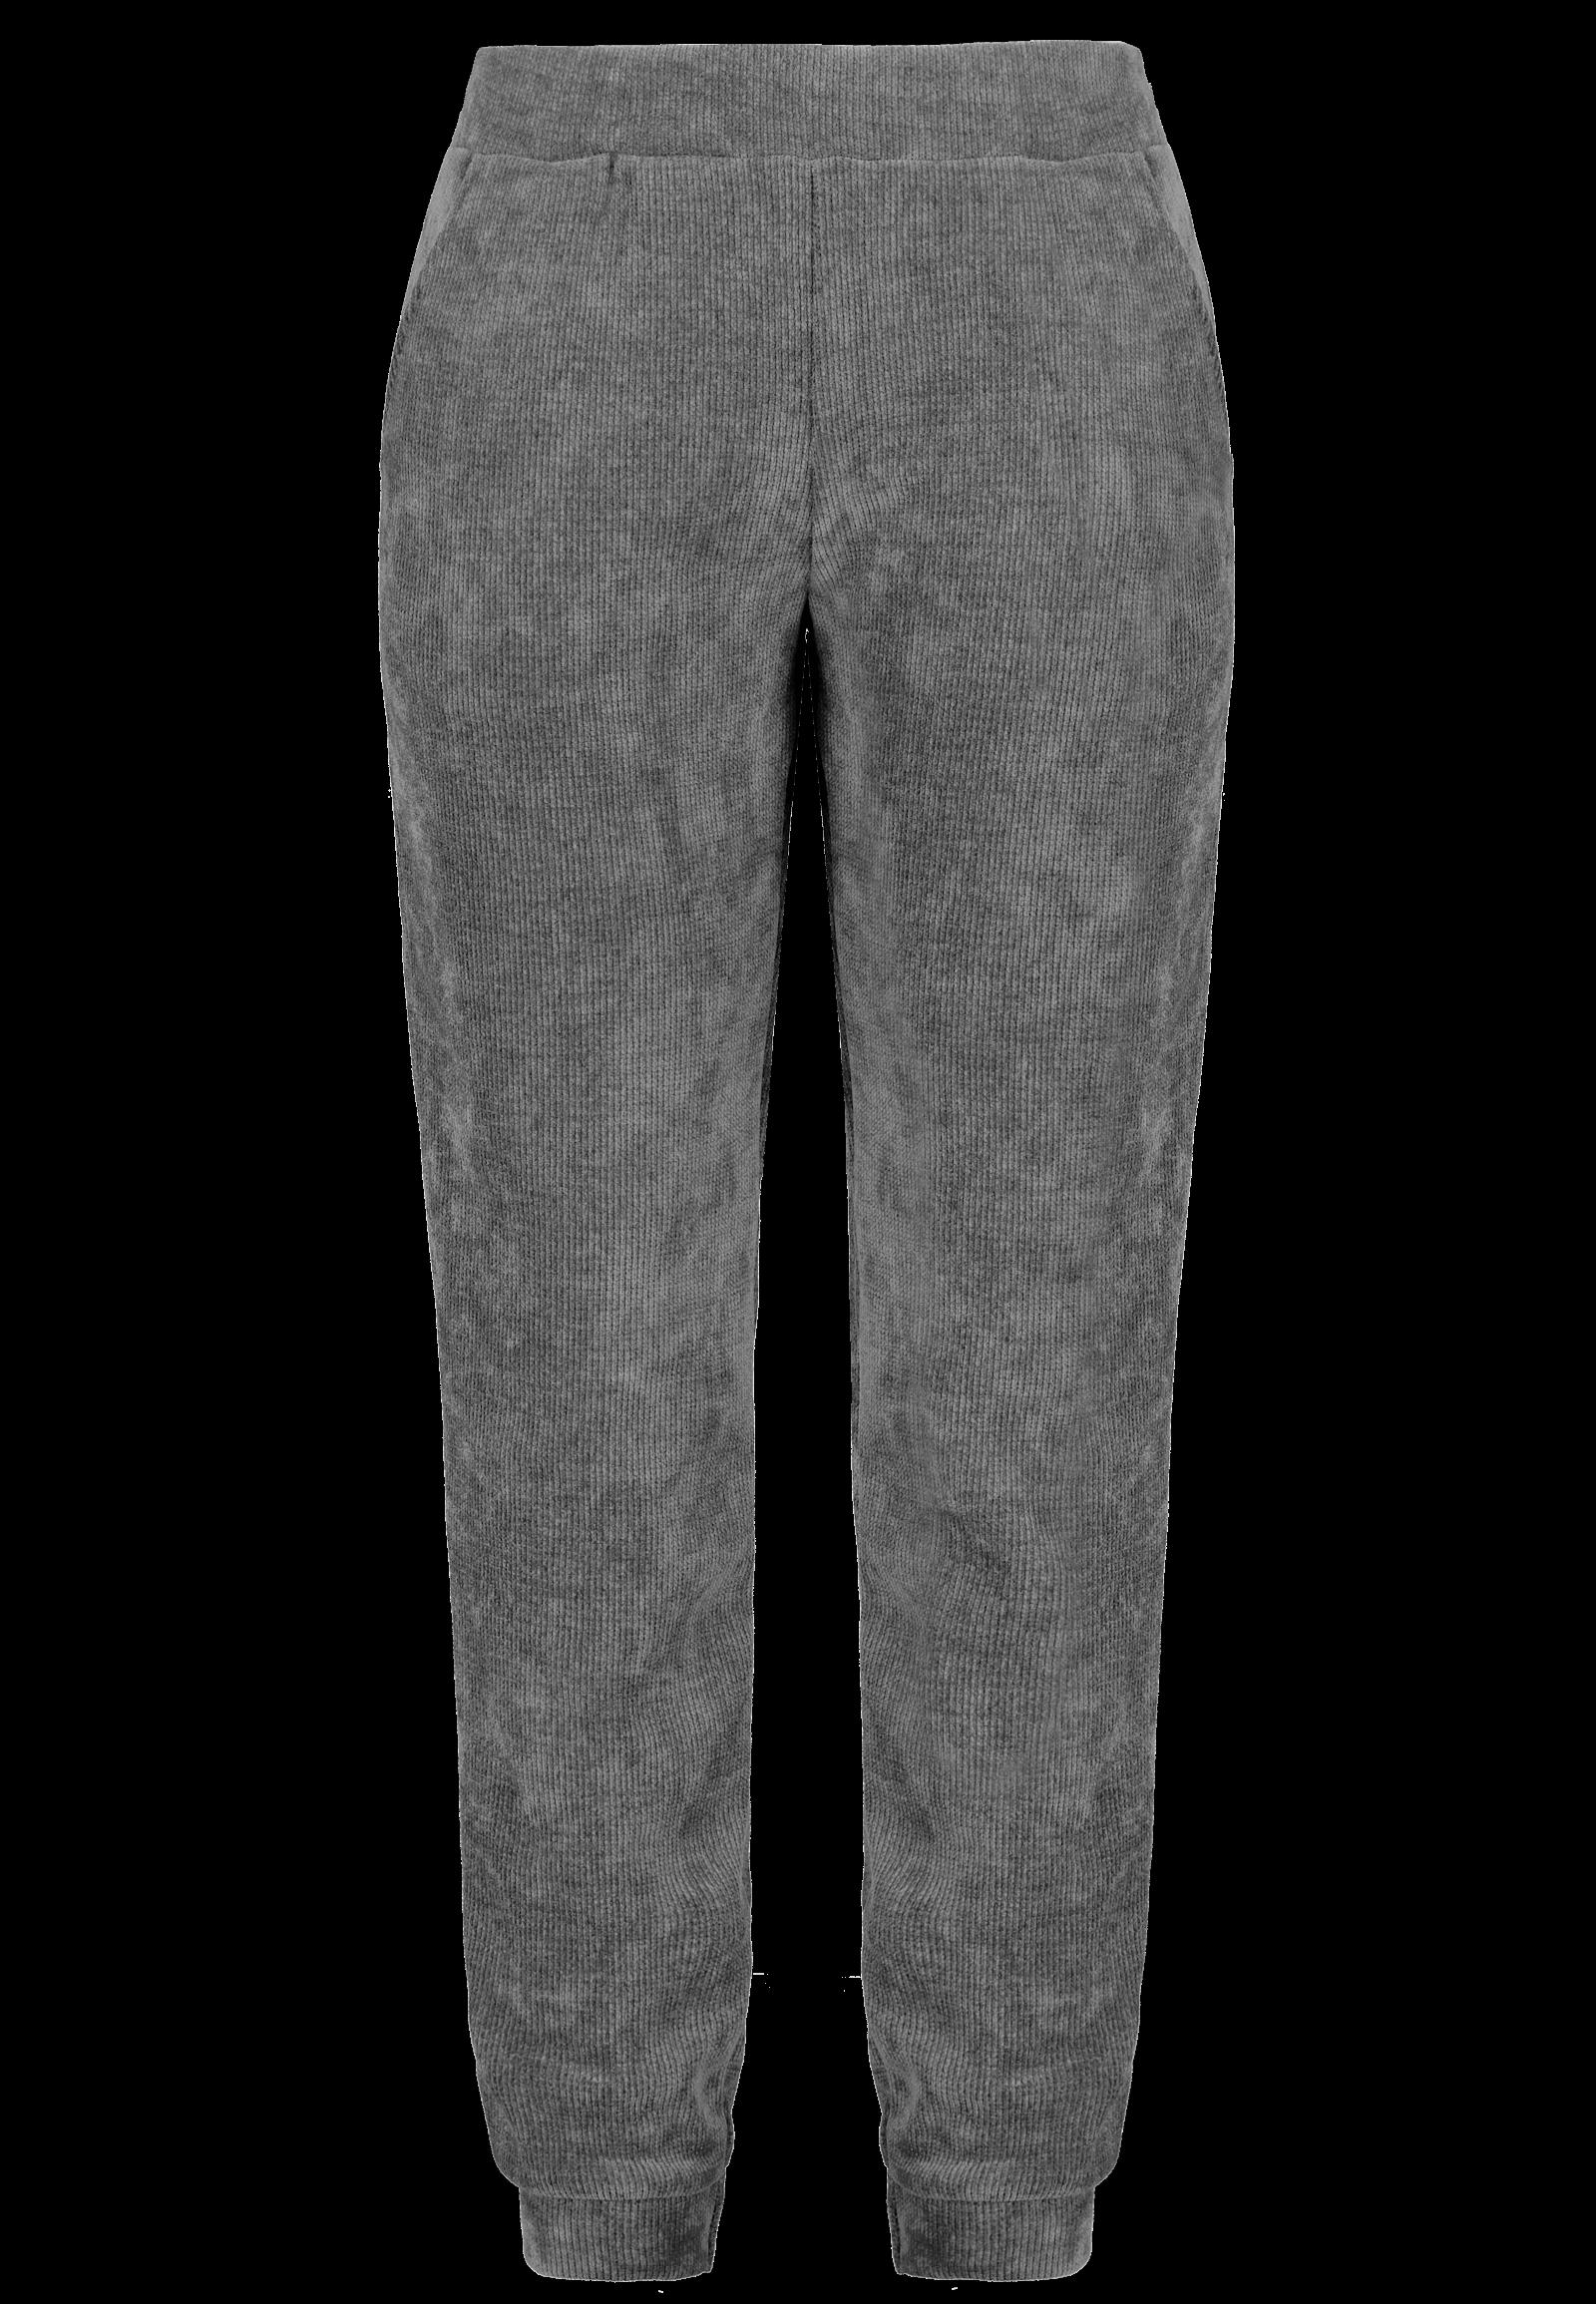 Cord-Hose Loungewear-Set grau